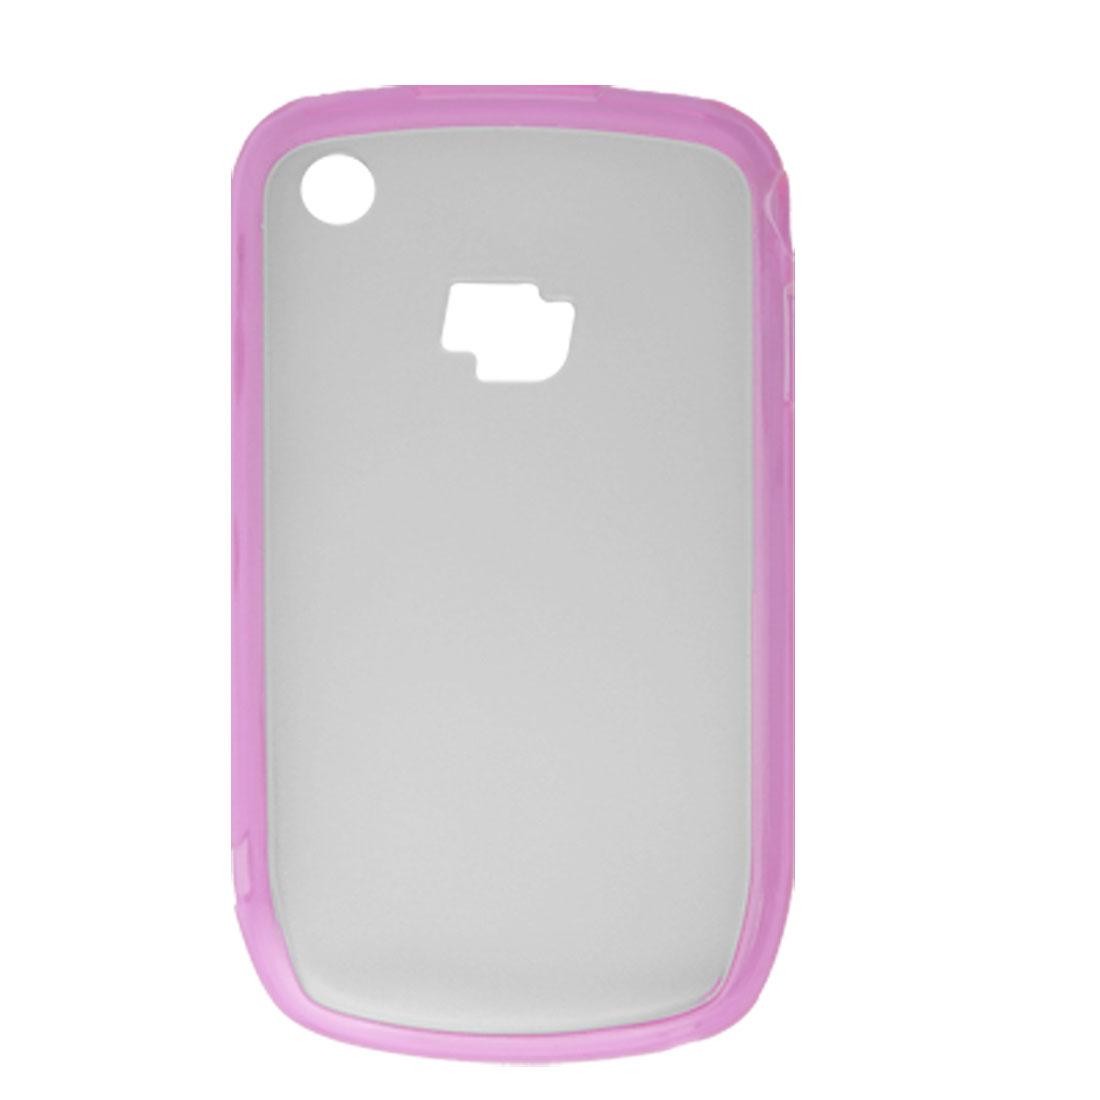 Hard Plastic Clear Anti Glare Case Skin for Blackberry 8520